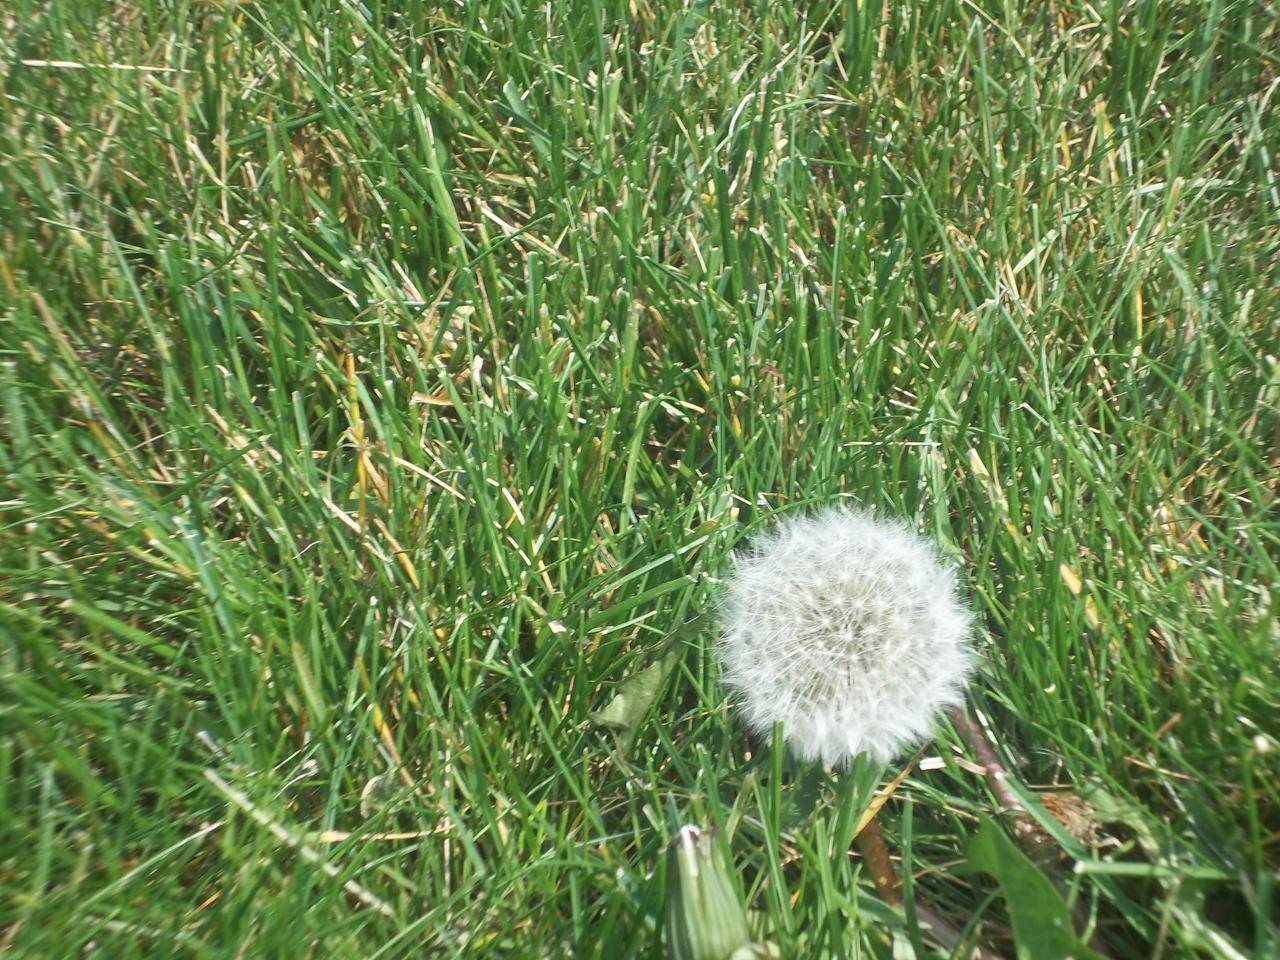 The wish flower by Vereesia on DeviantArt